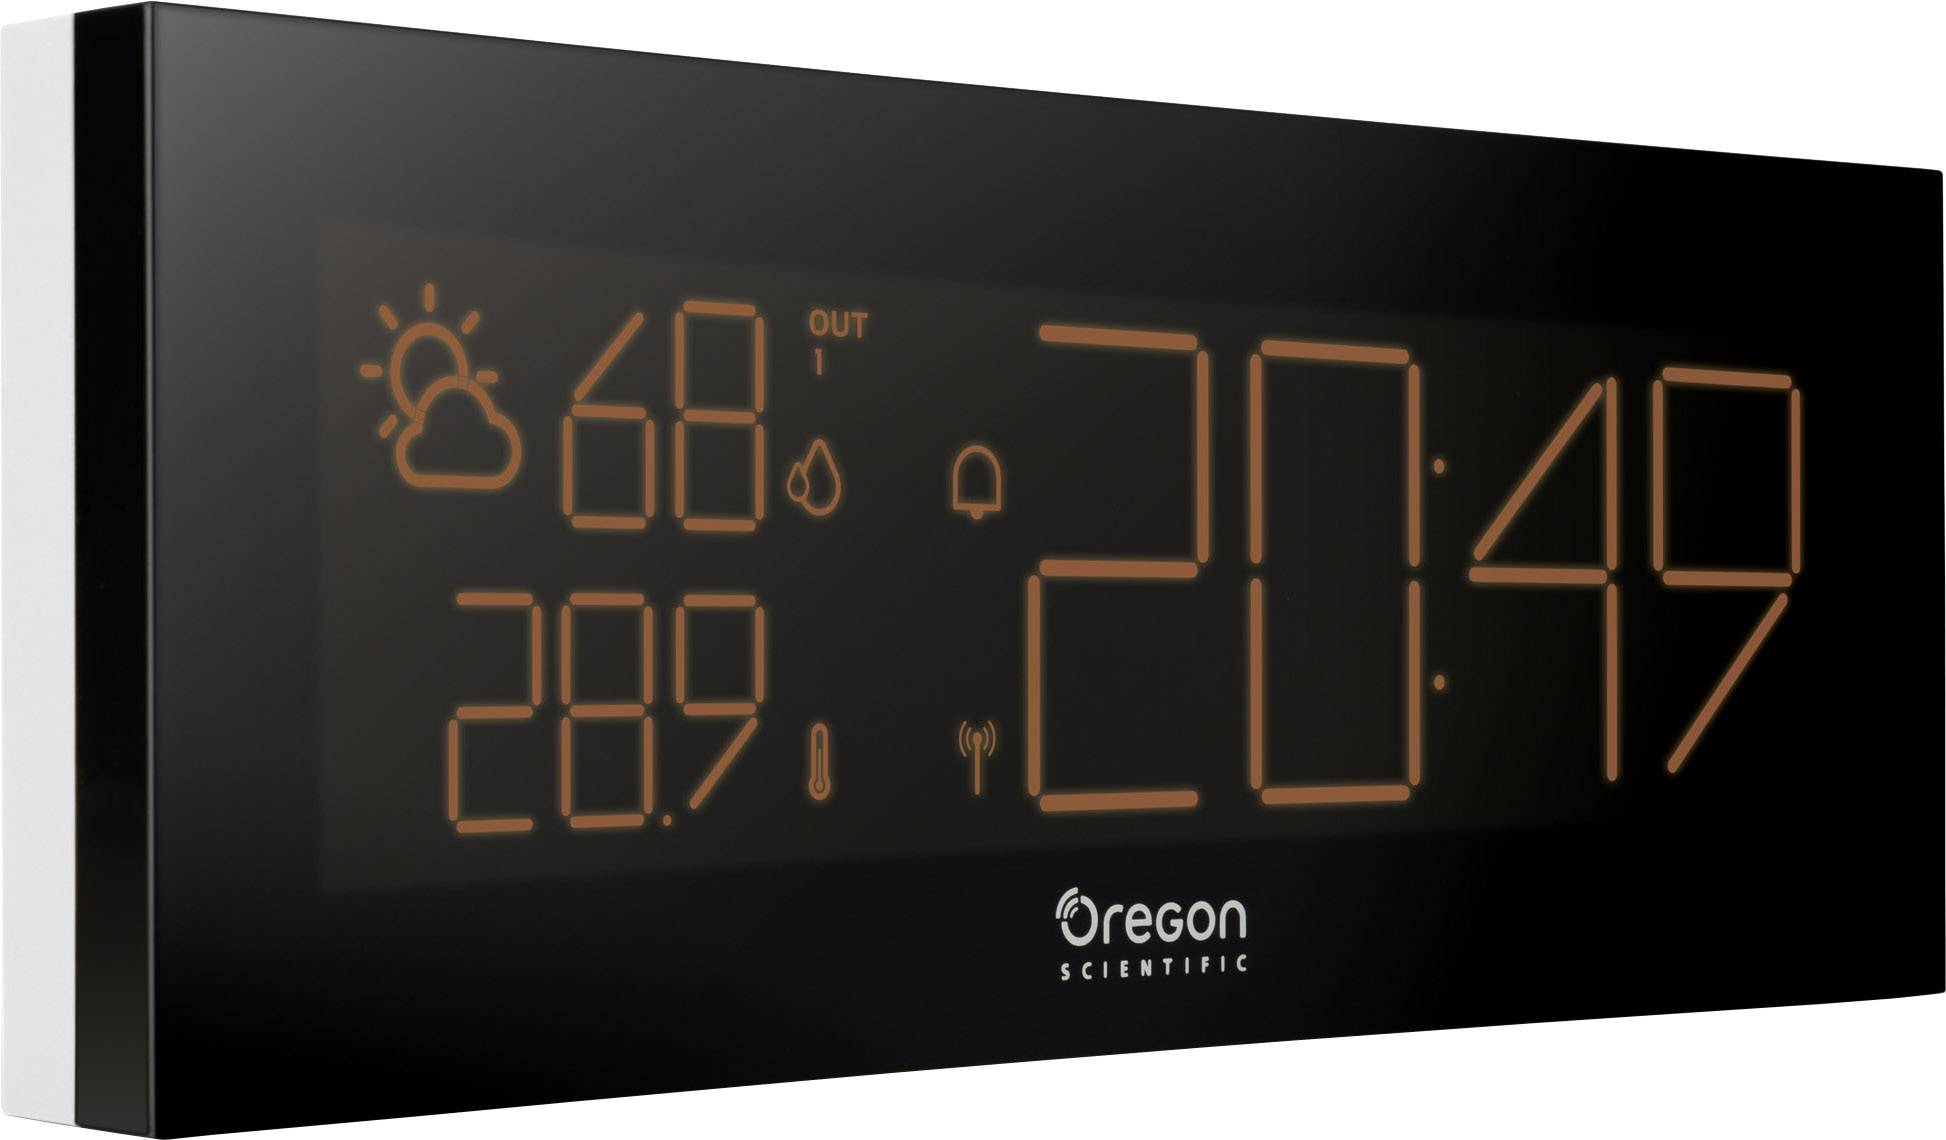 Digitálna bezdrôtová meteostanica Oregon Scientific